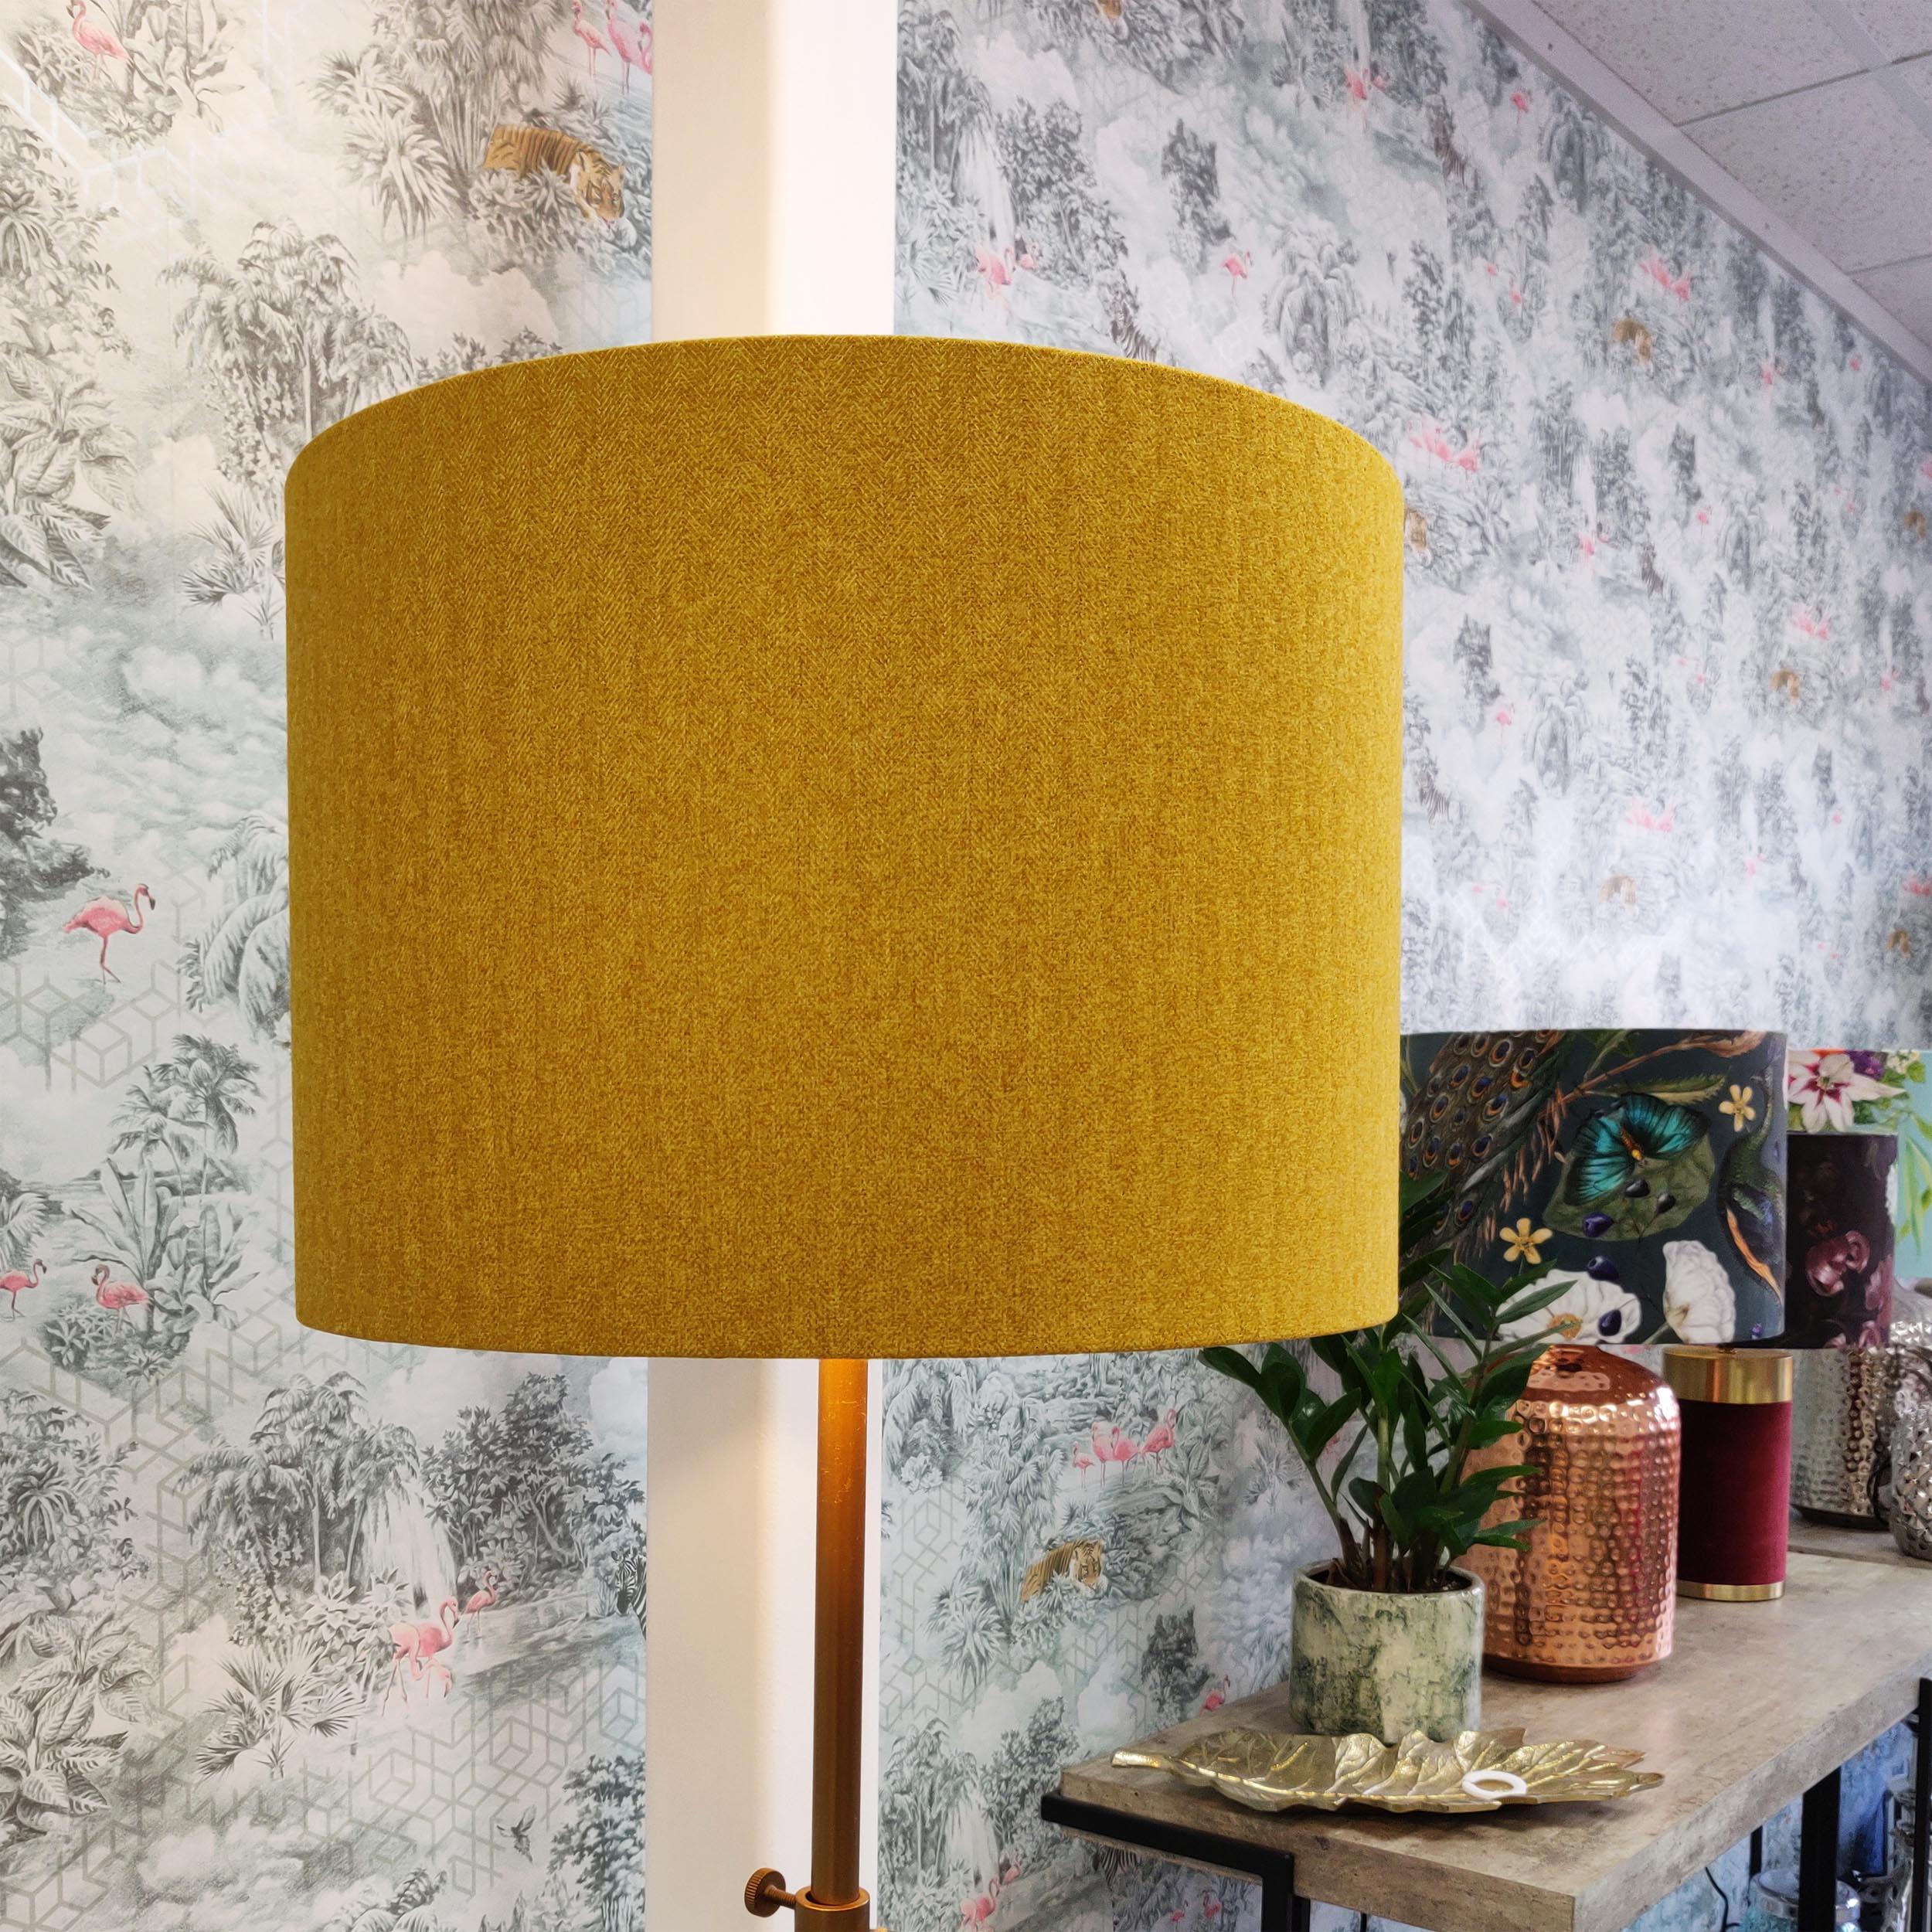 Mustard Lampshade in a Herringbone Tweed Design